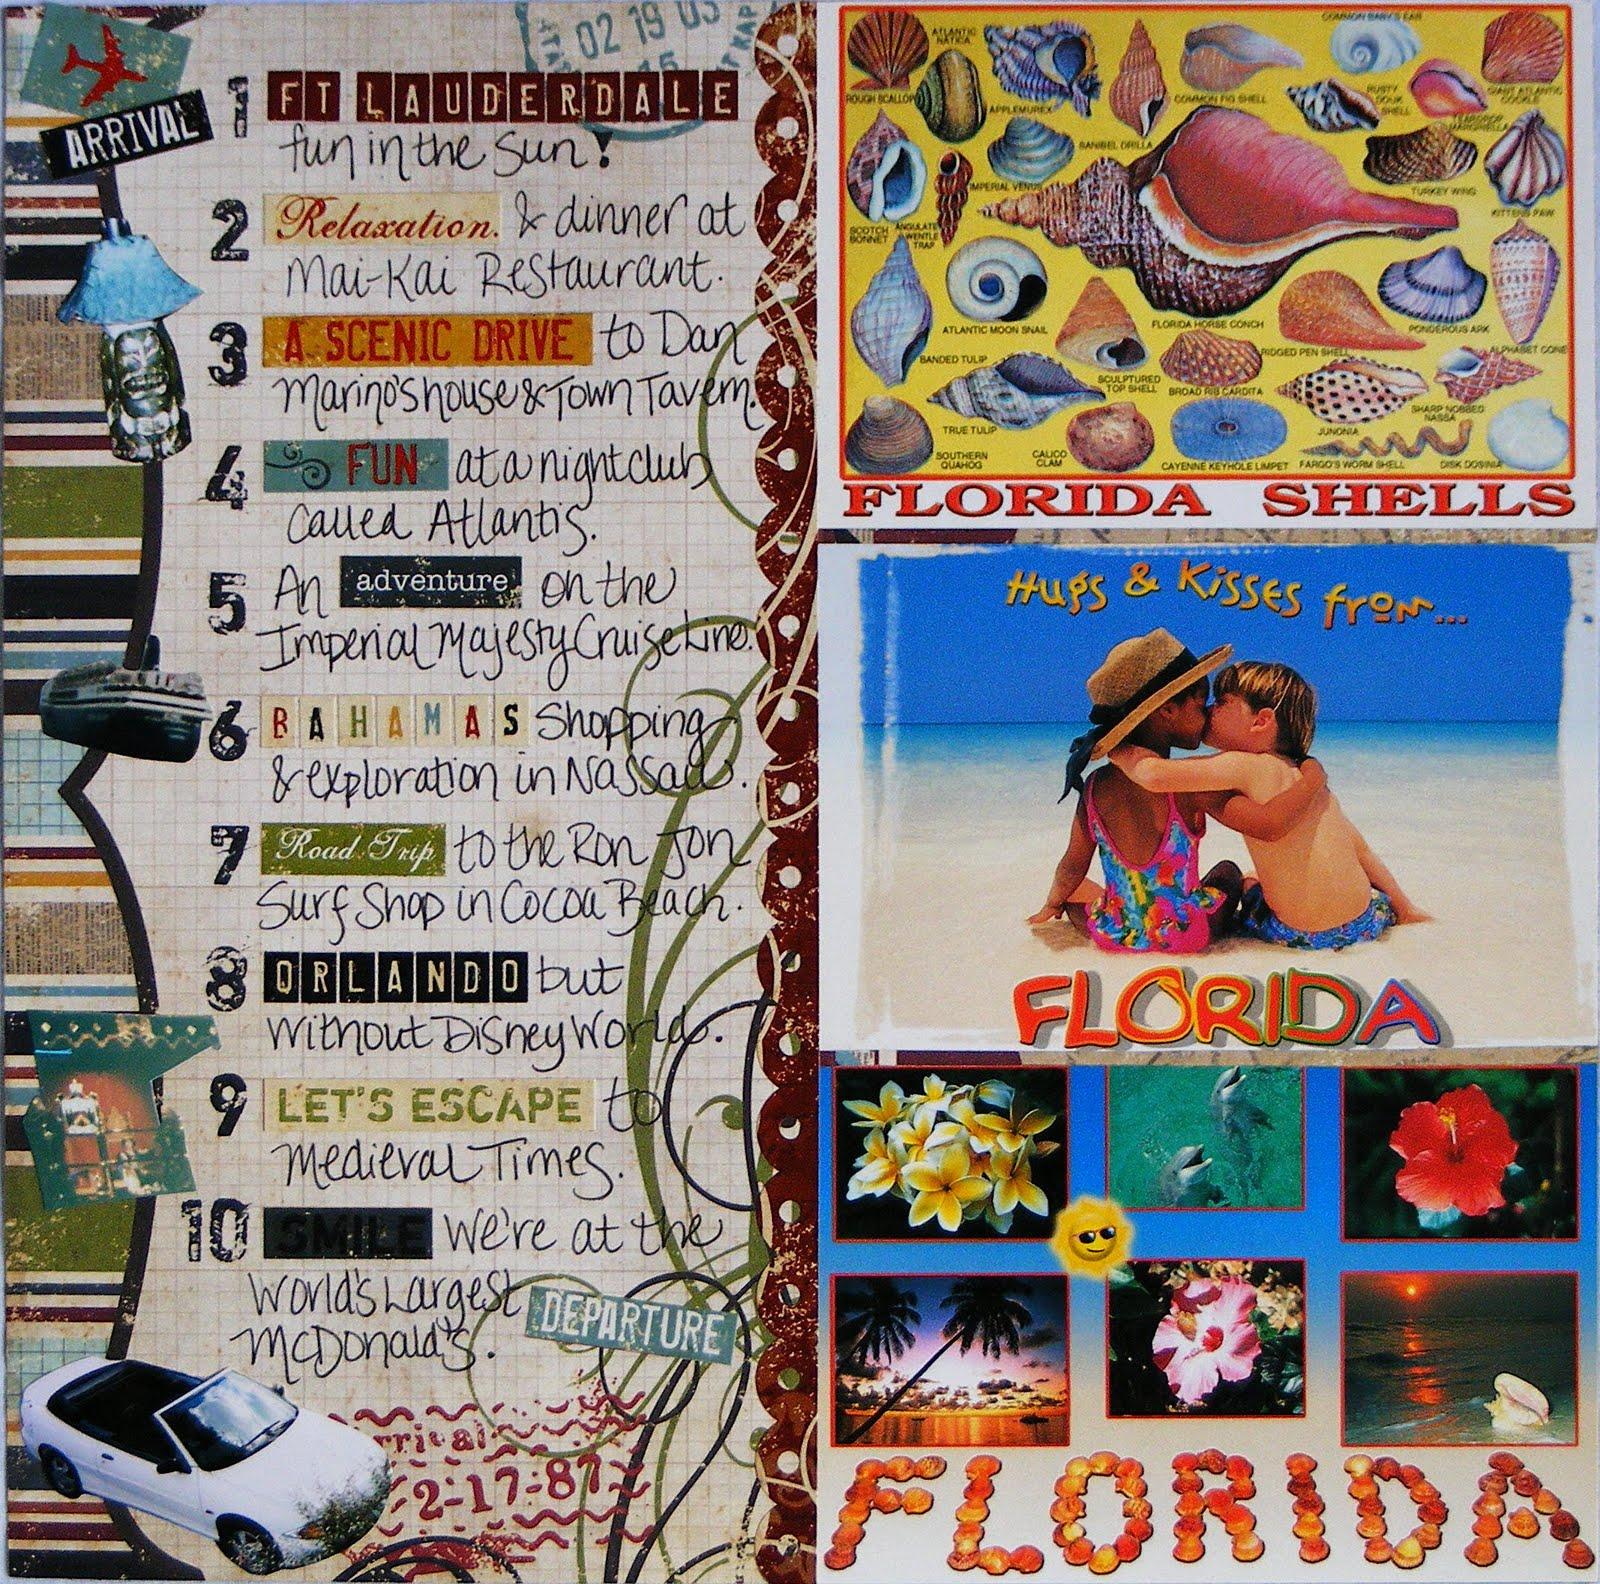 How to scrapbook a road trip - The Honeymoon Scrapbook Album Fort Lauderdale